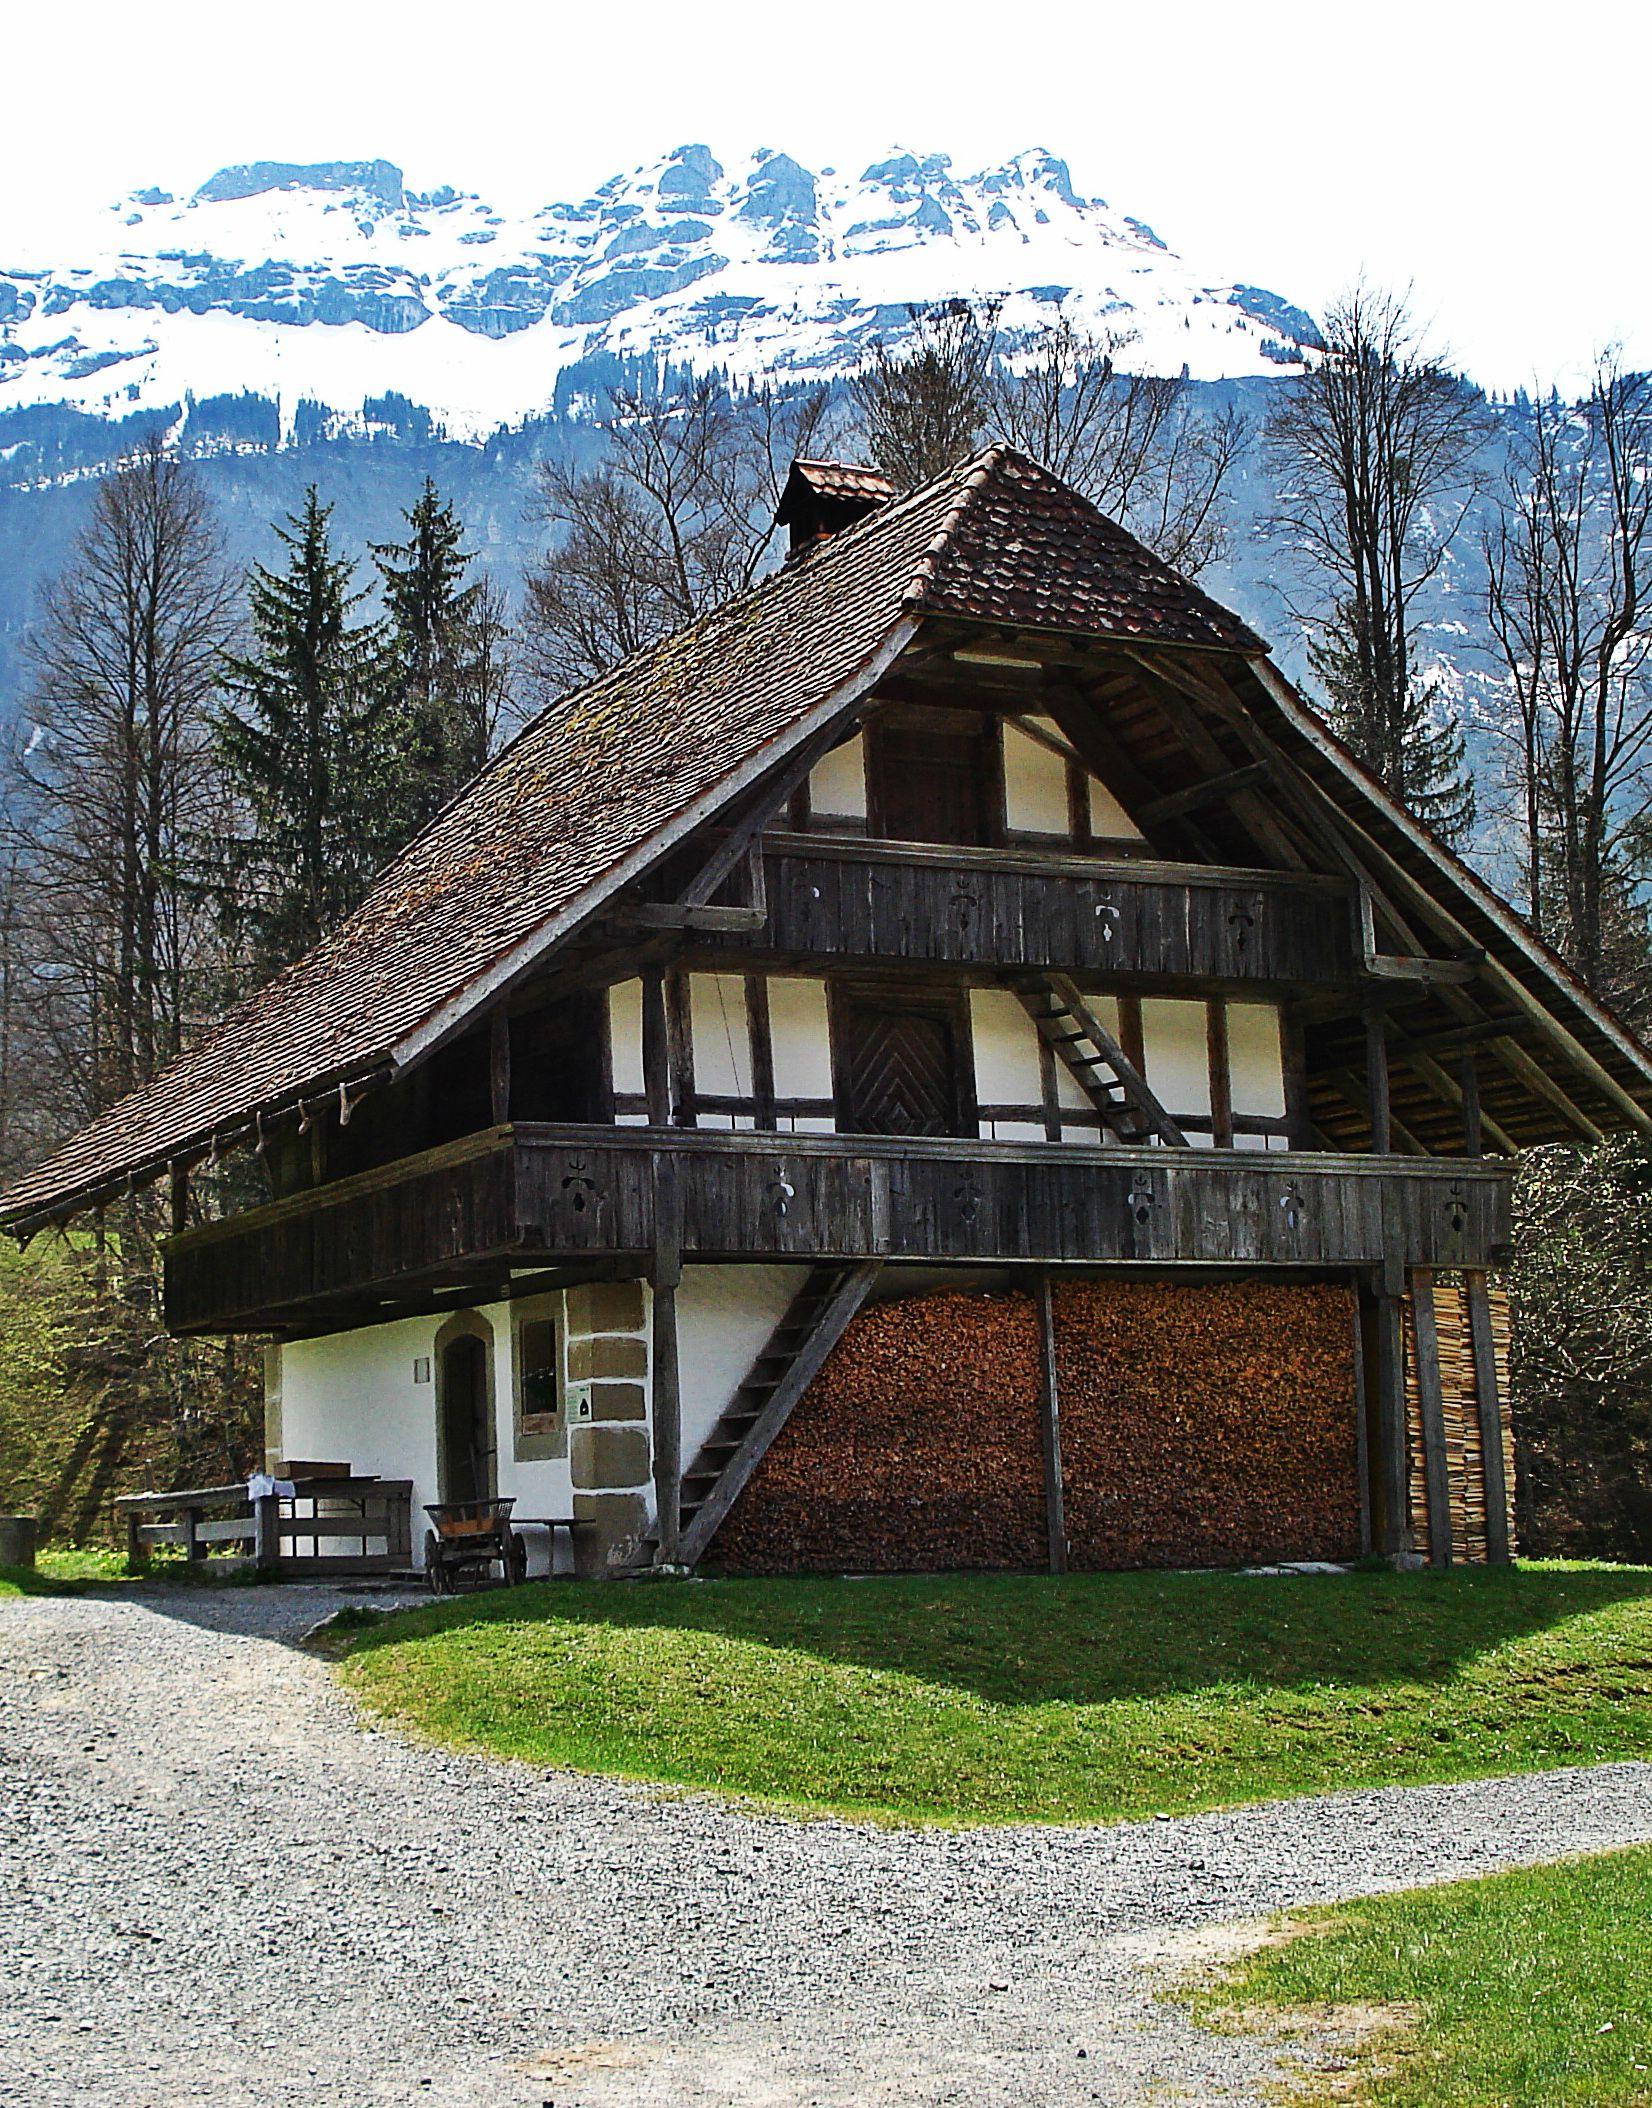 Ballenberg is an open air museum in Switzerland that